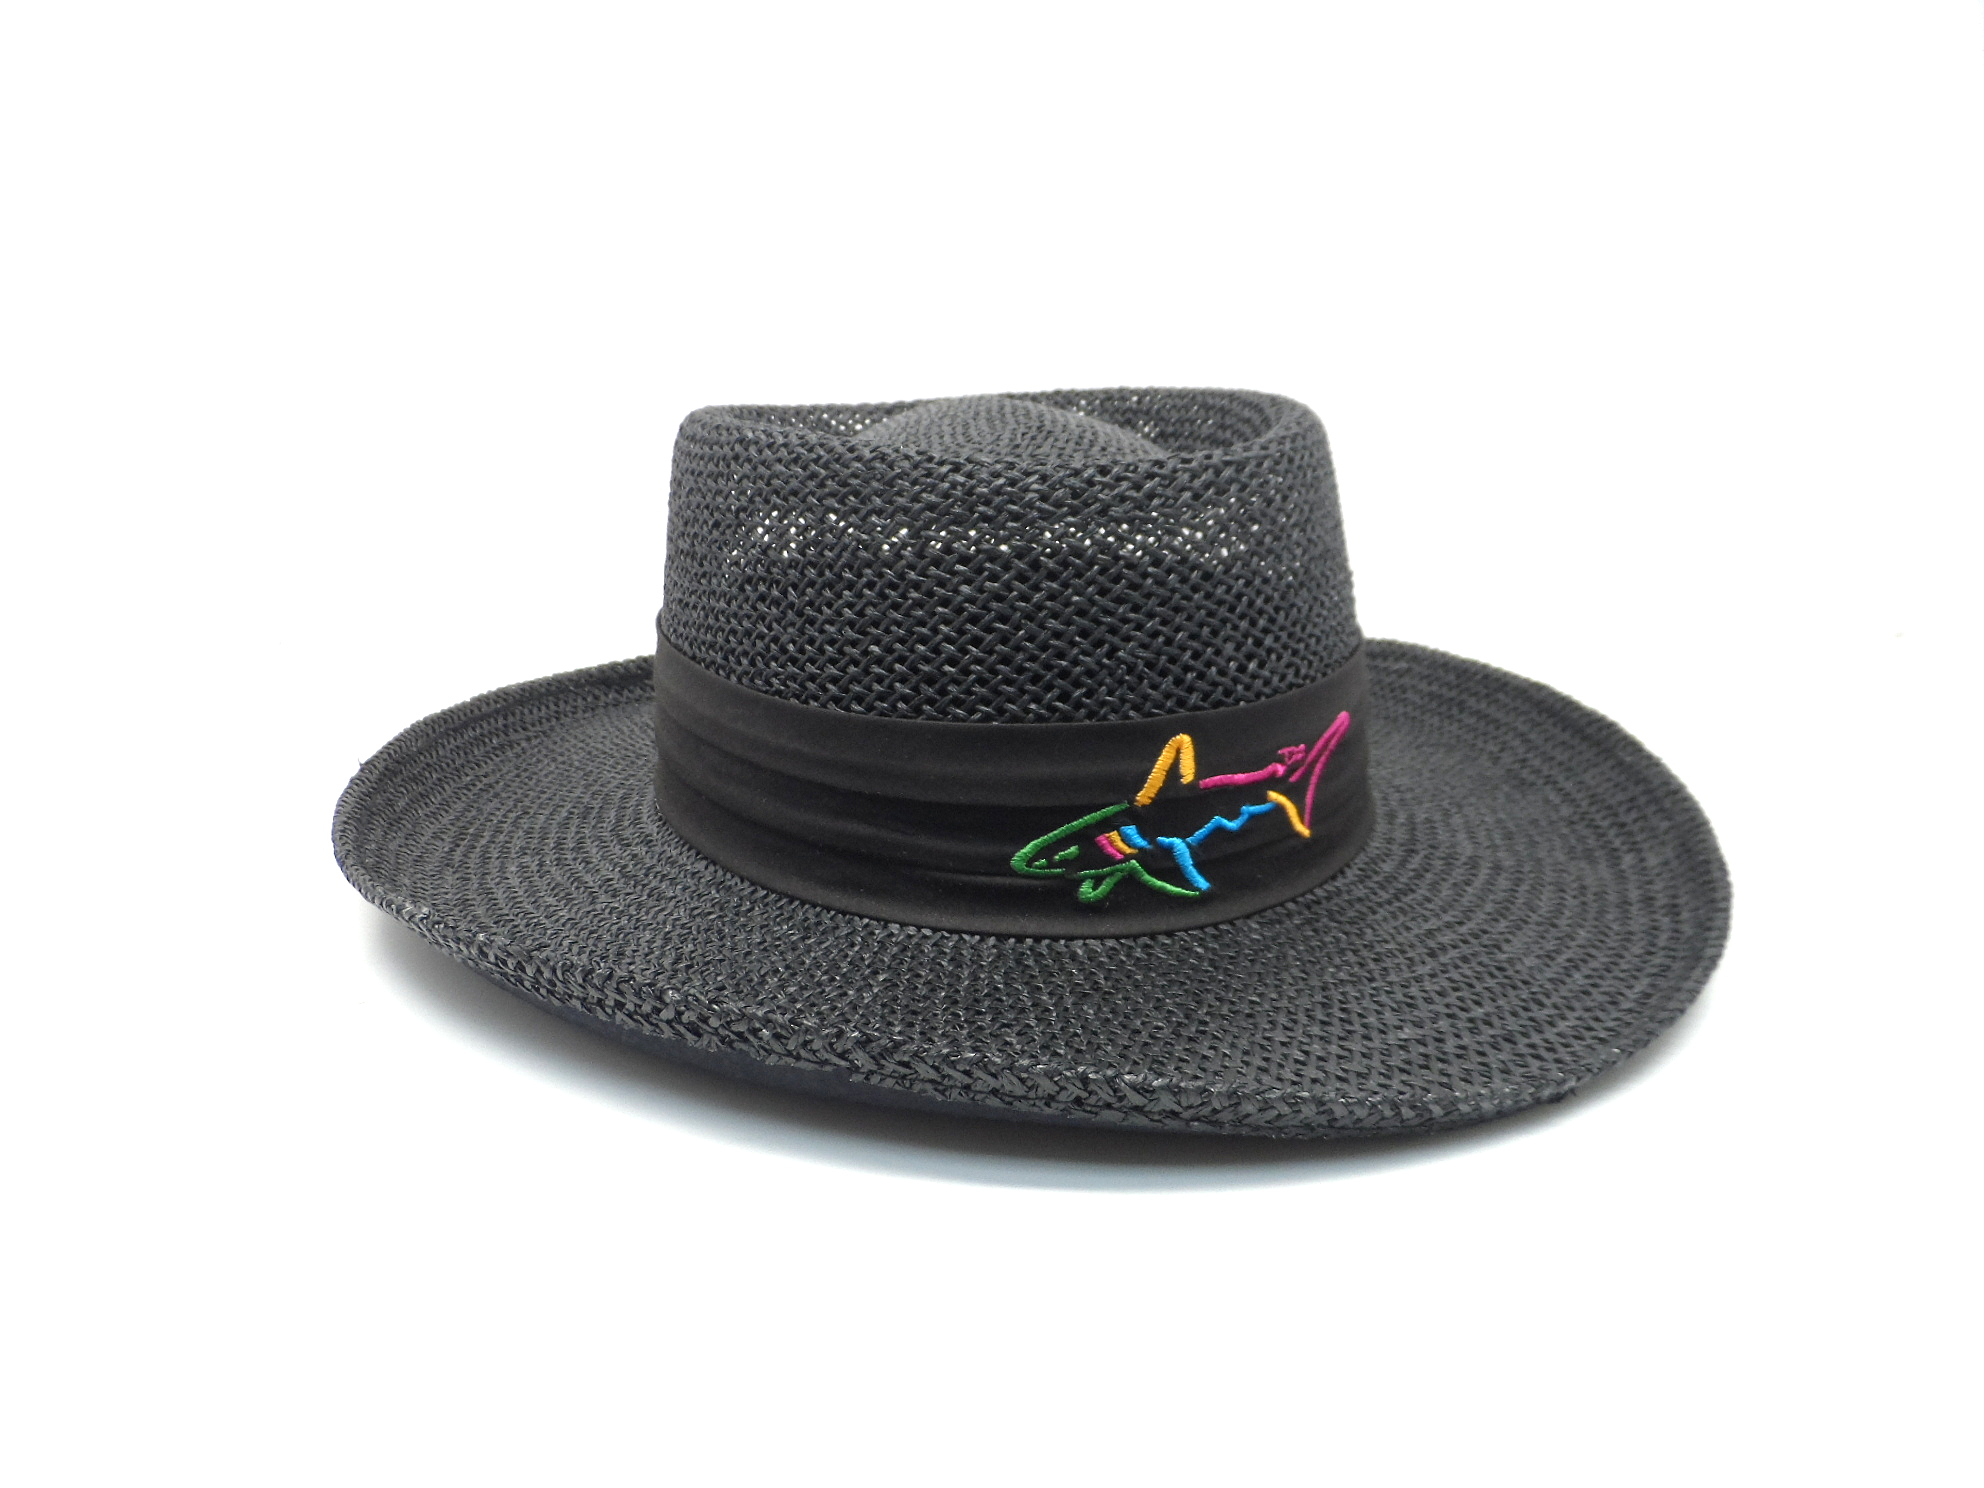 Greg Norman Straw Golf Hats for Men